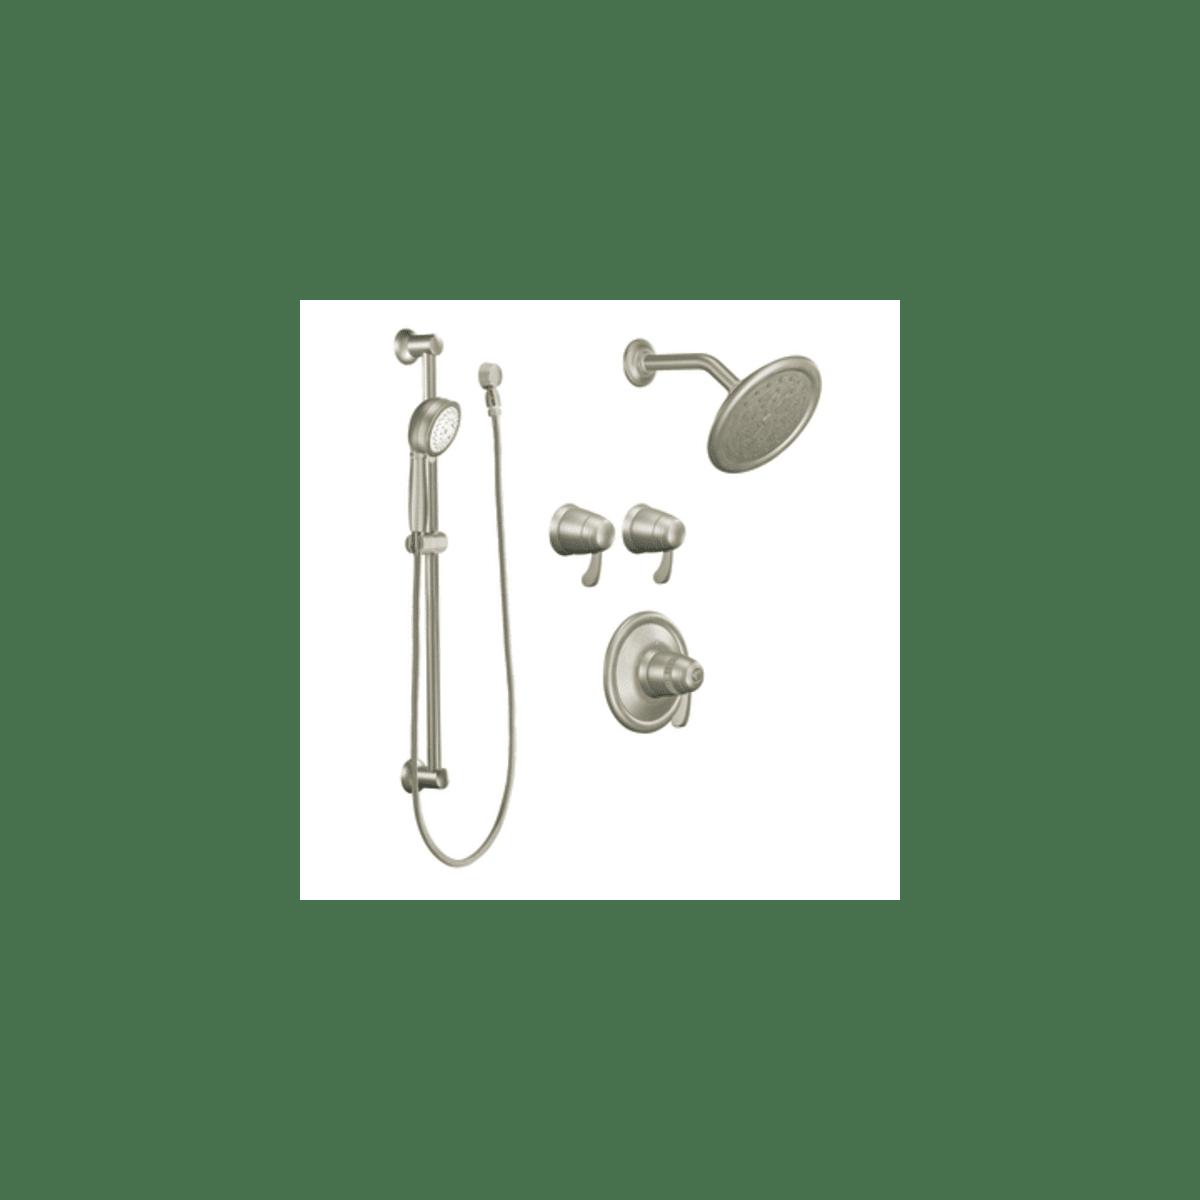 Moen Ts270orb Oil Rubbed Bronze Triple Handle Vertical Spa